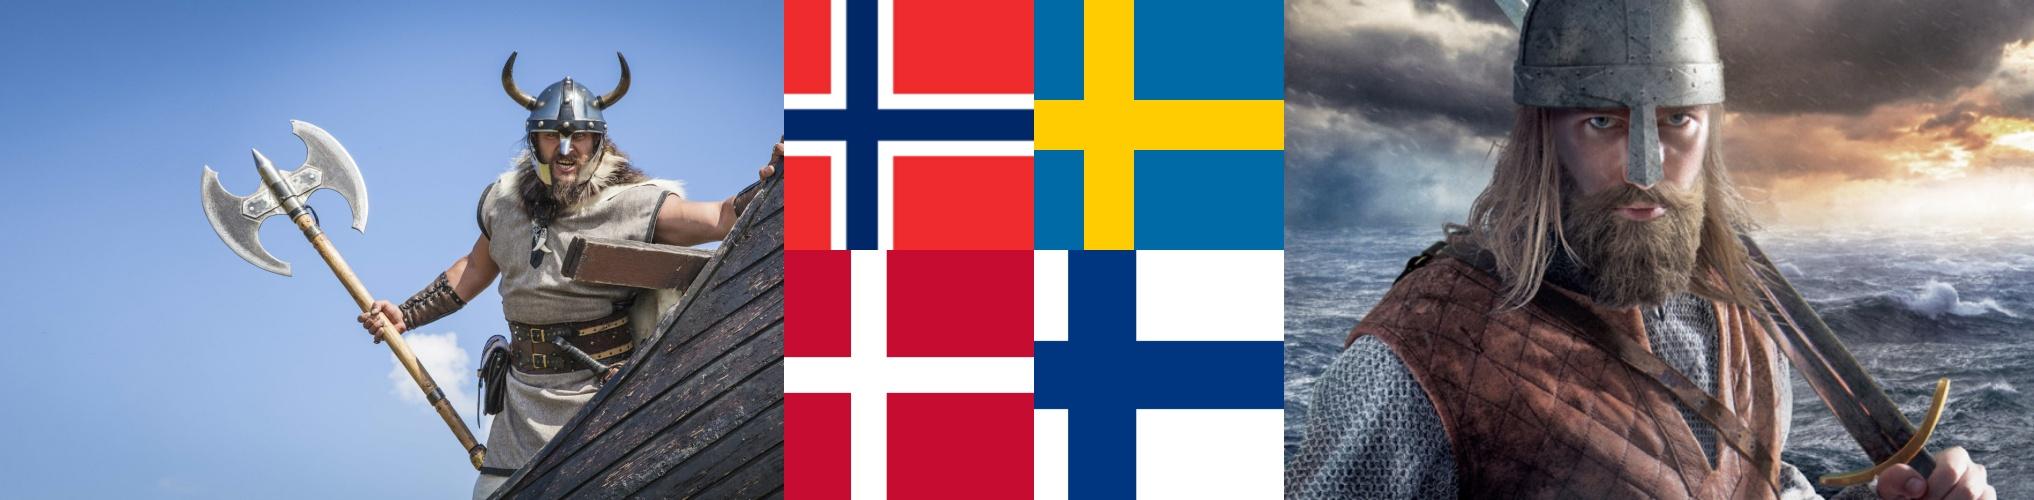 Nordic-minitourney.jpg